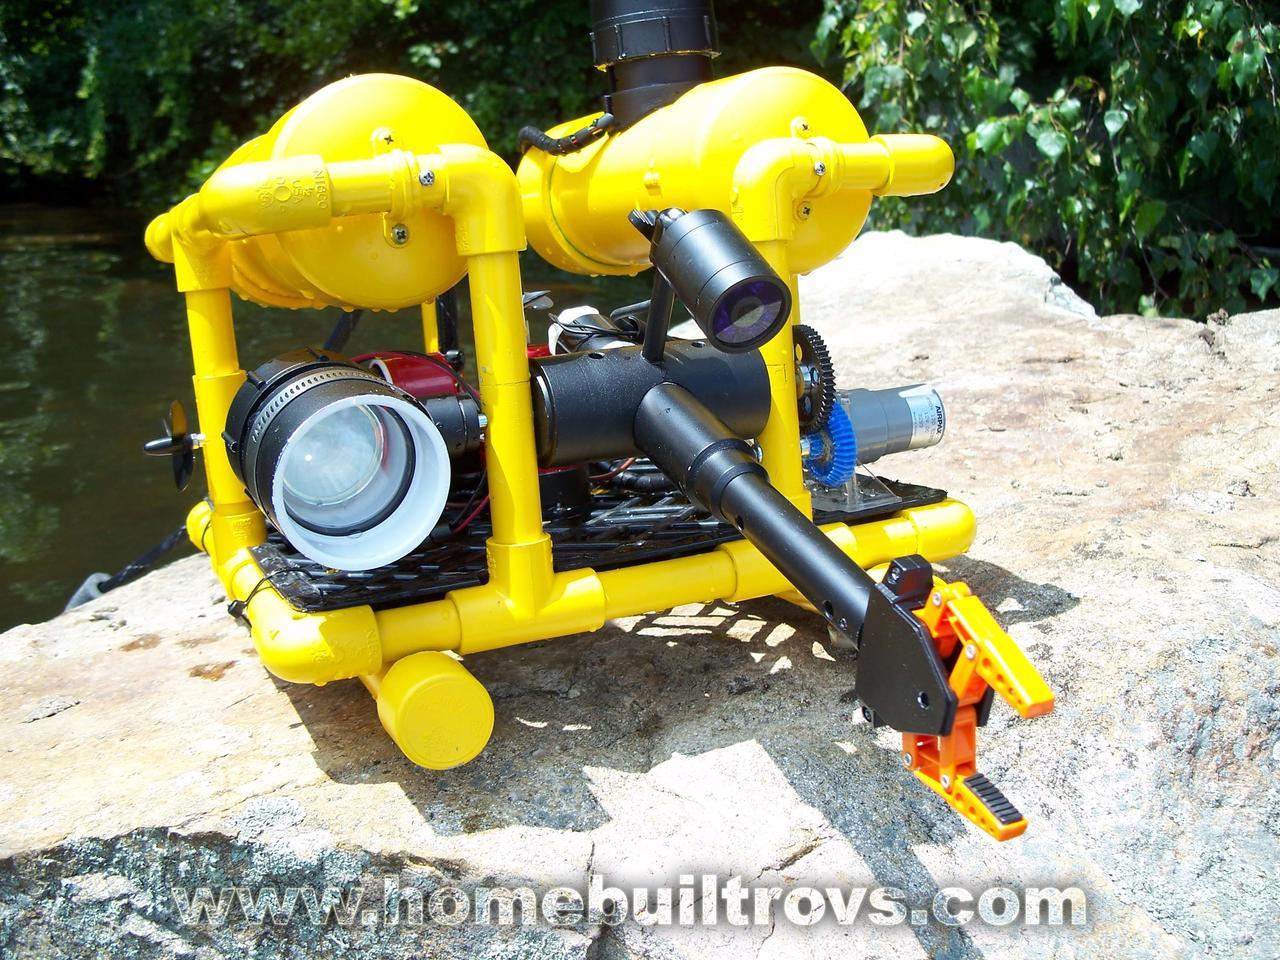 Hobbyist Steve Thone's homebuilt SeaFox, with custom propulsion and manipulator arm (Photo: Steve Thone)